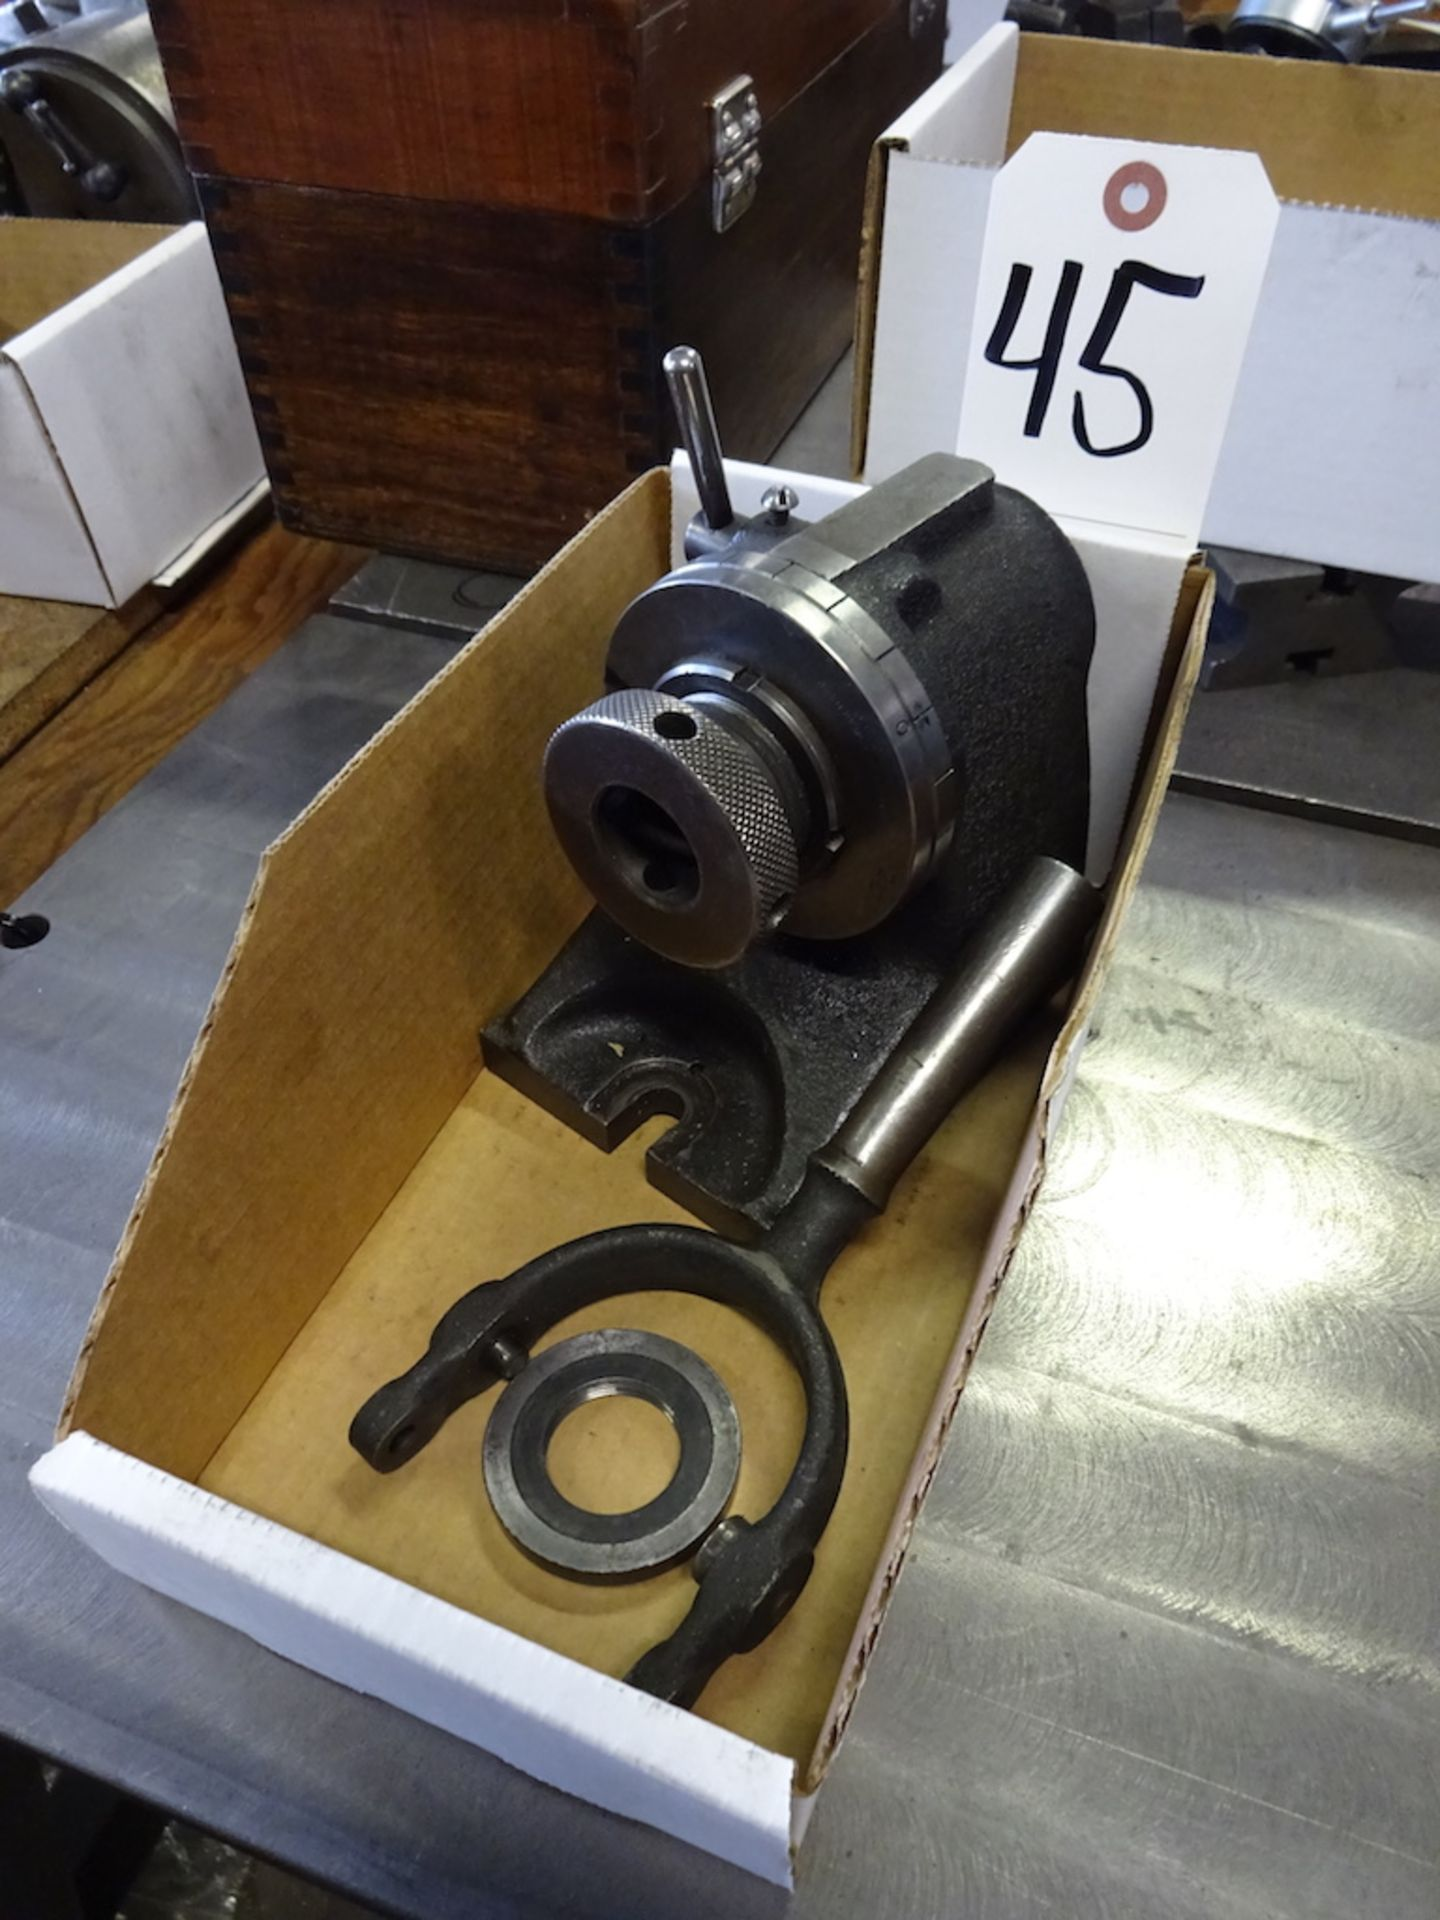 Lot 45 - HARDINGE MODEL H-450 GRINDING FIXTURE